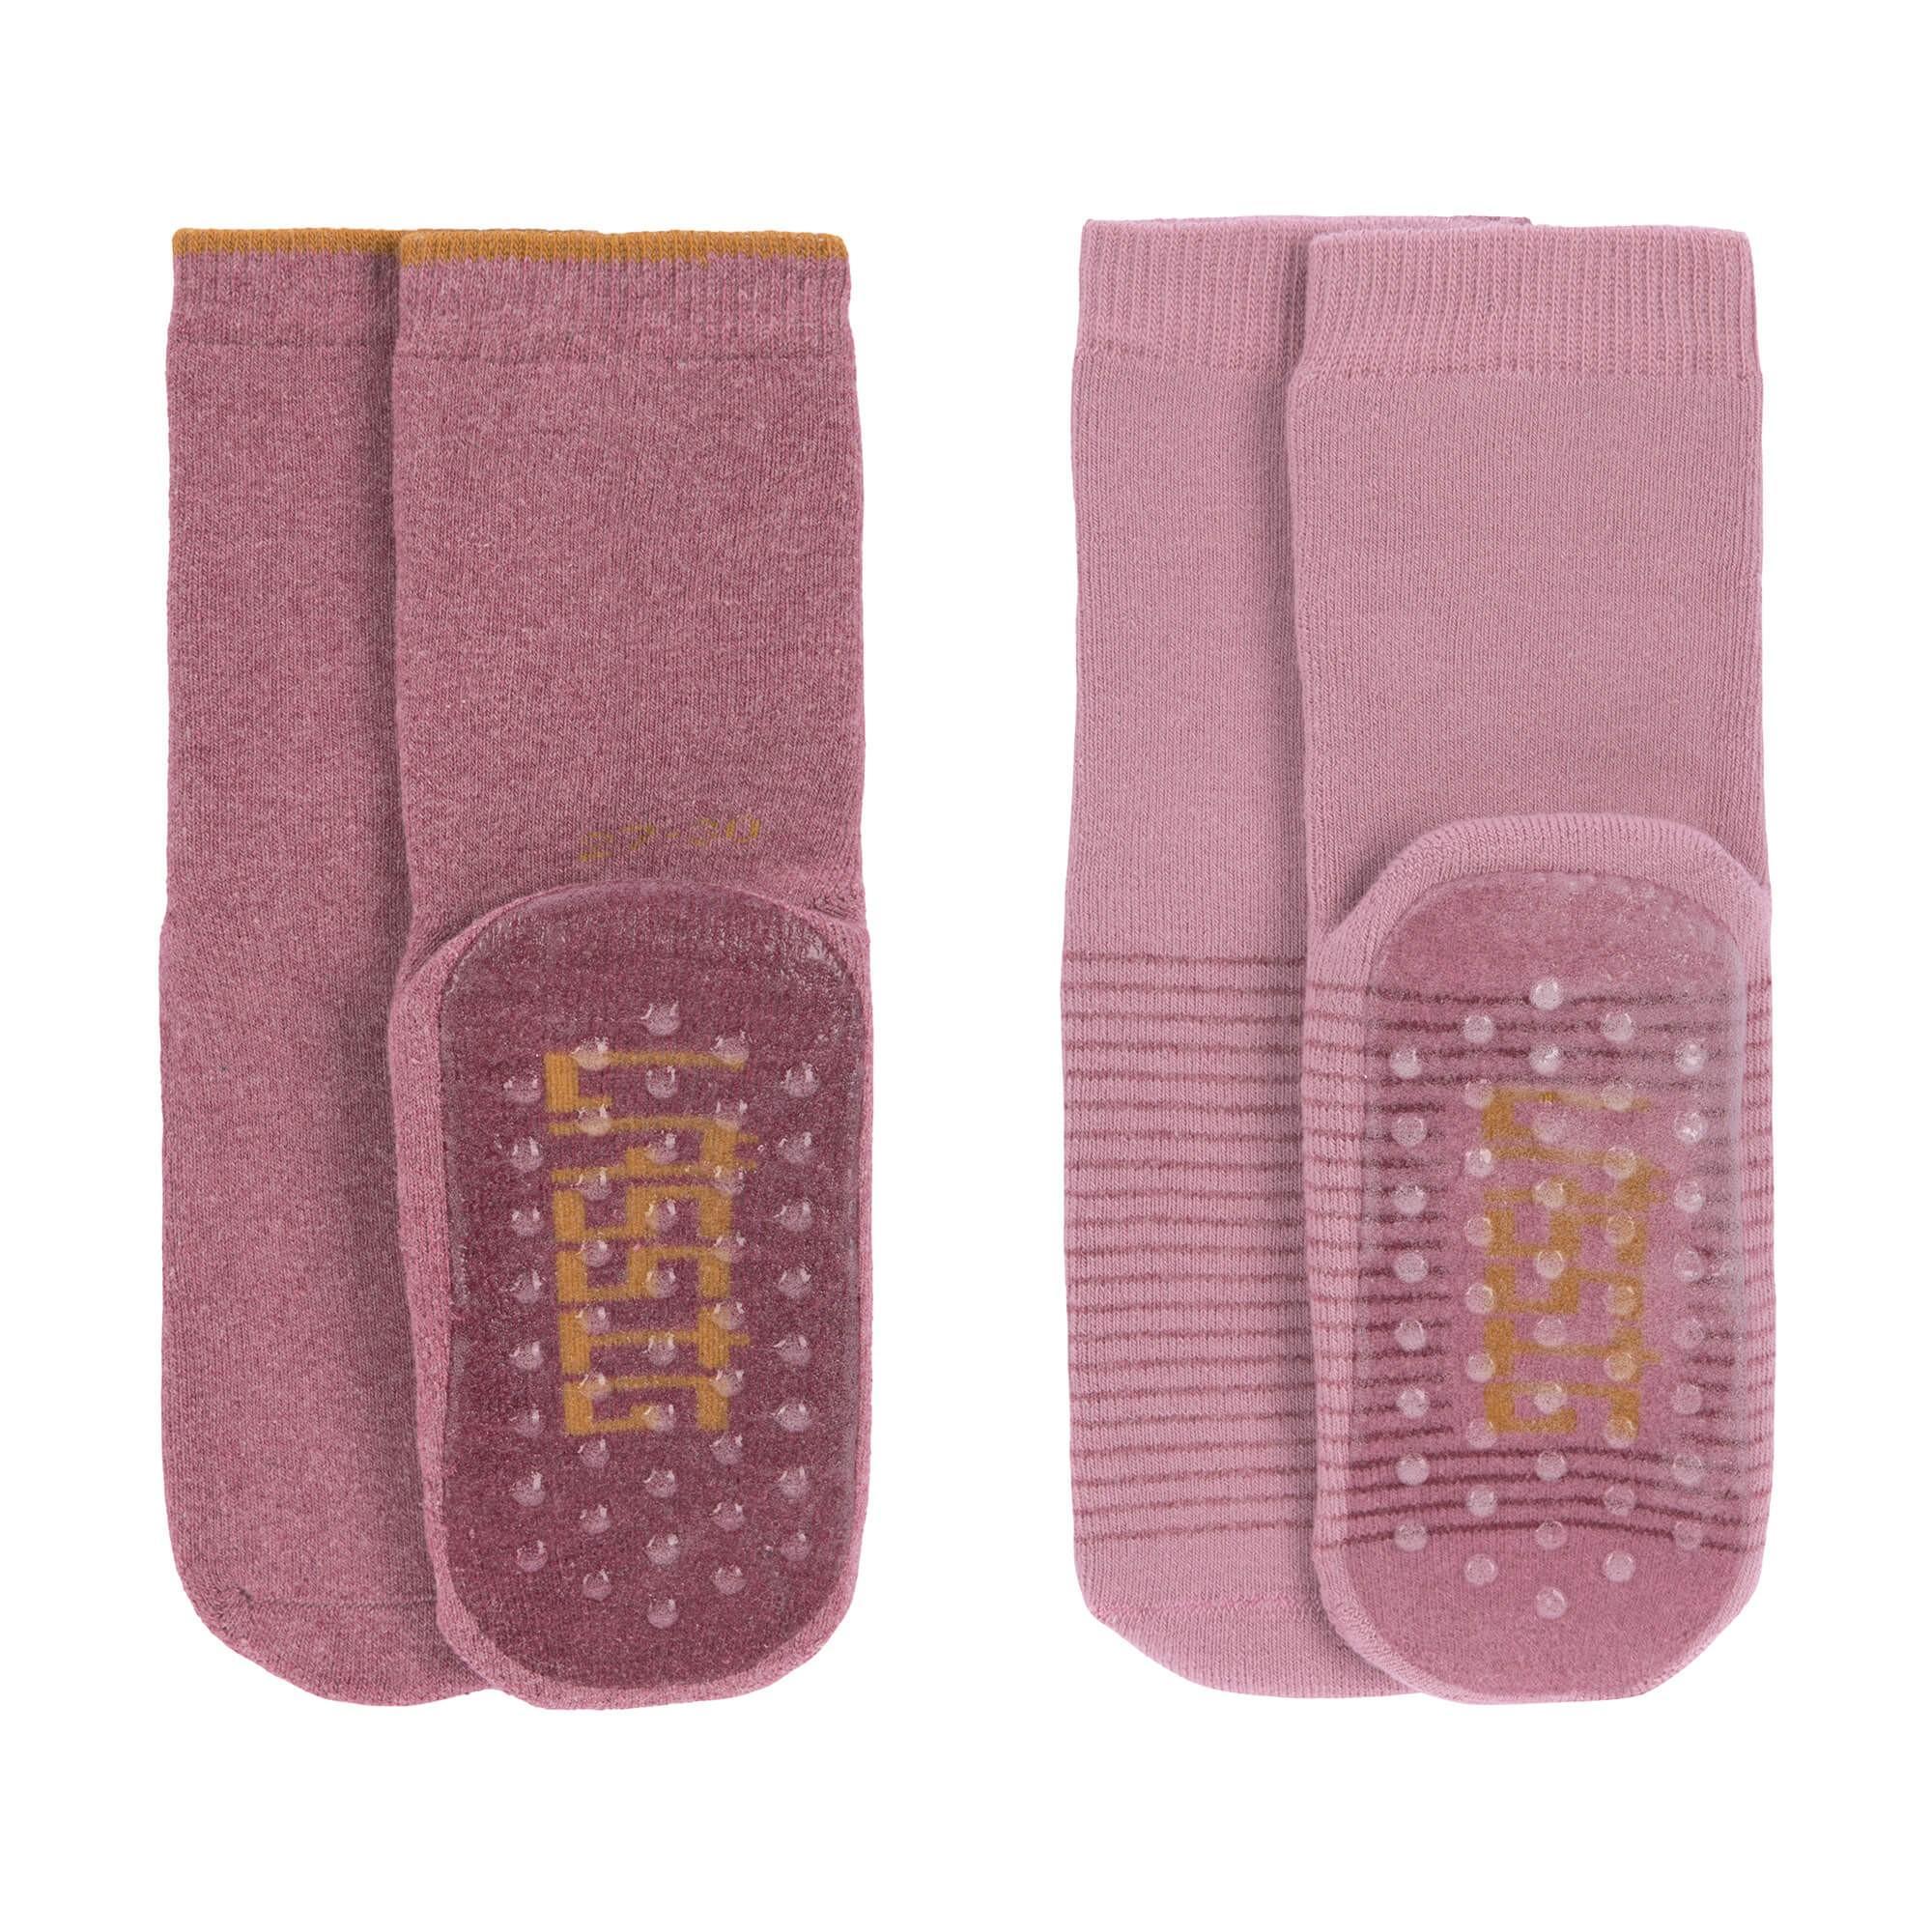 Lassig - Anti-slip Socks 2 pcs. assorted rosewood/rose, Size: 27-30